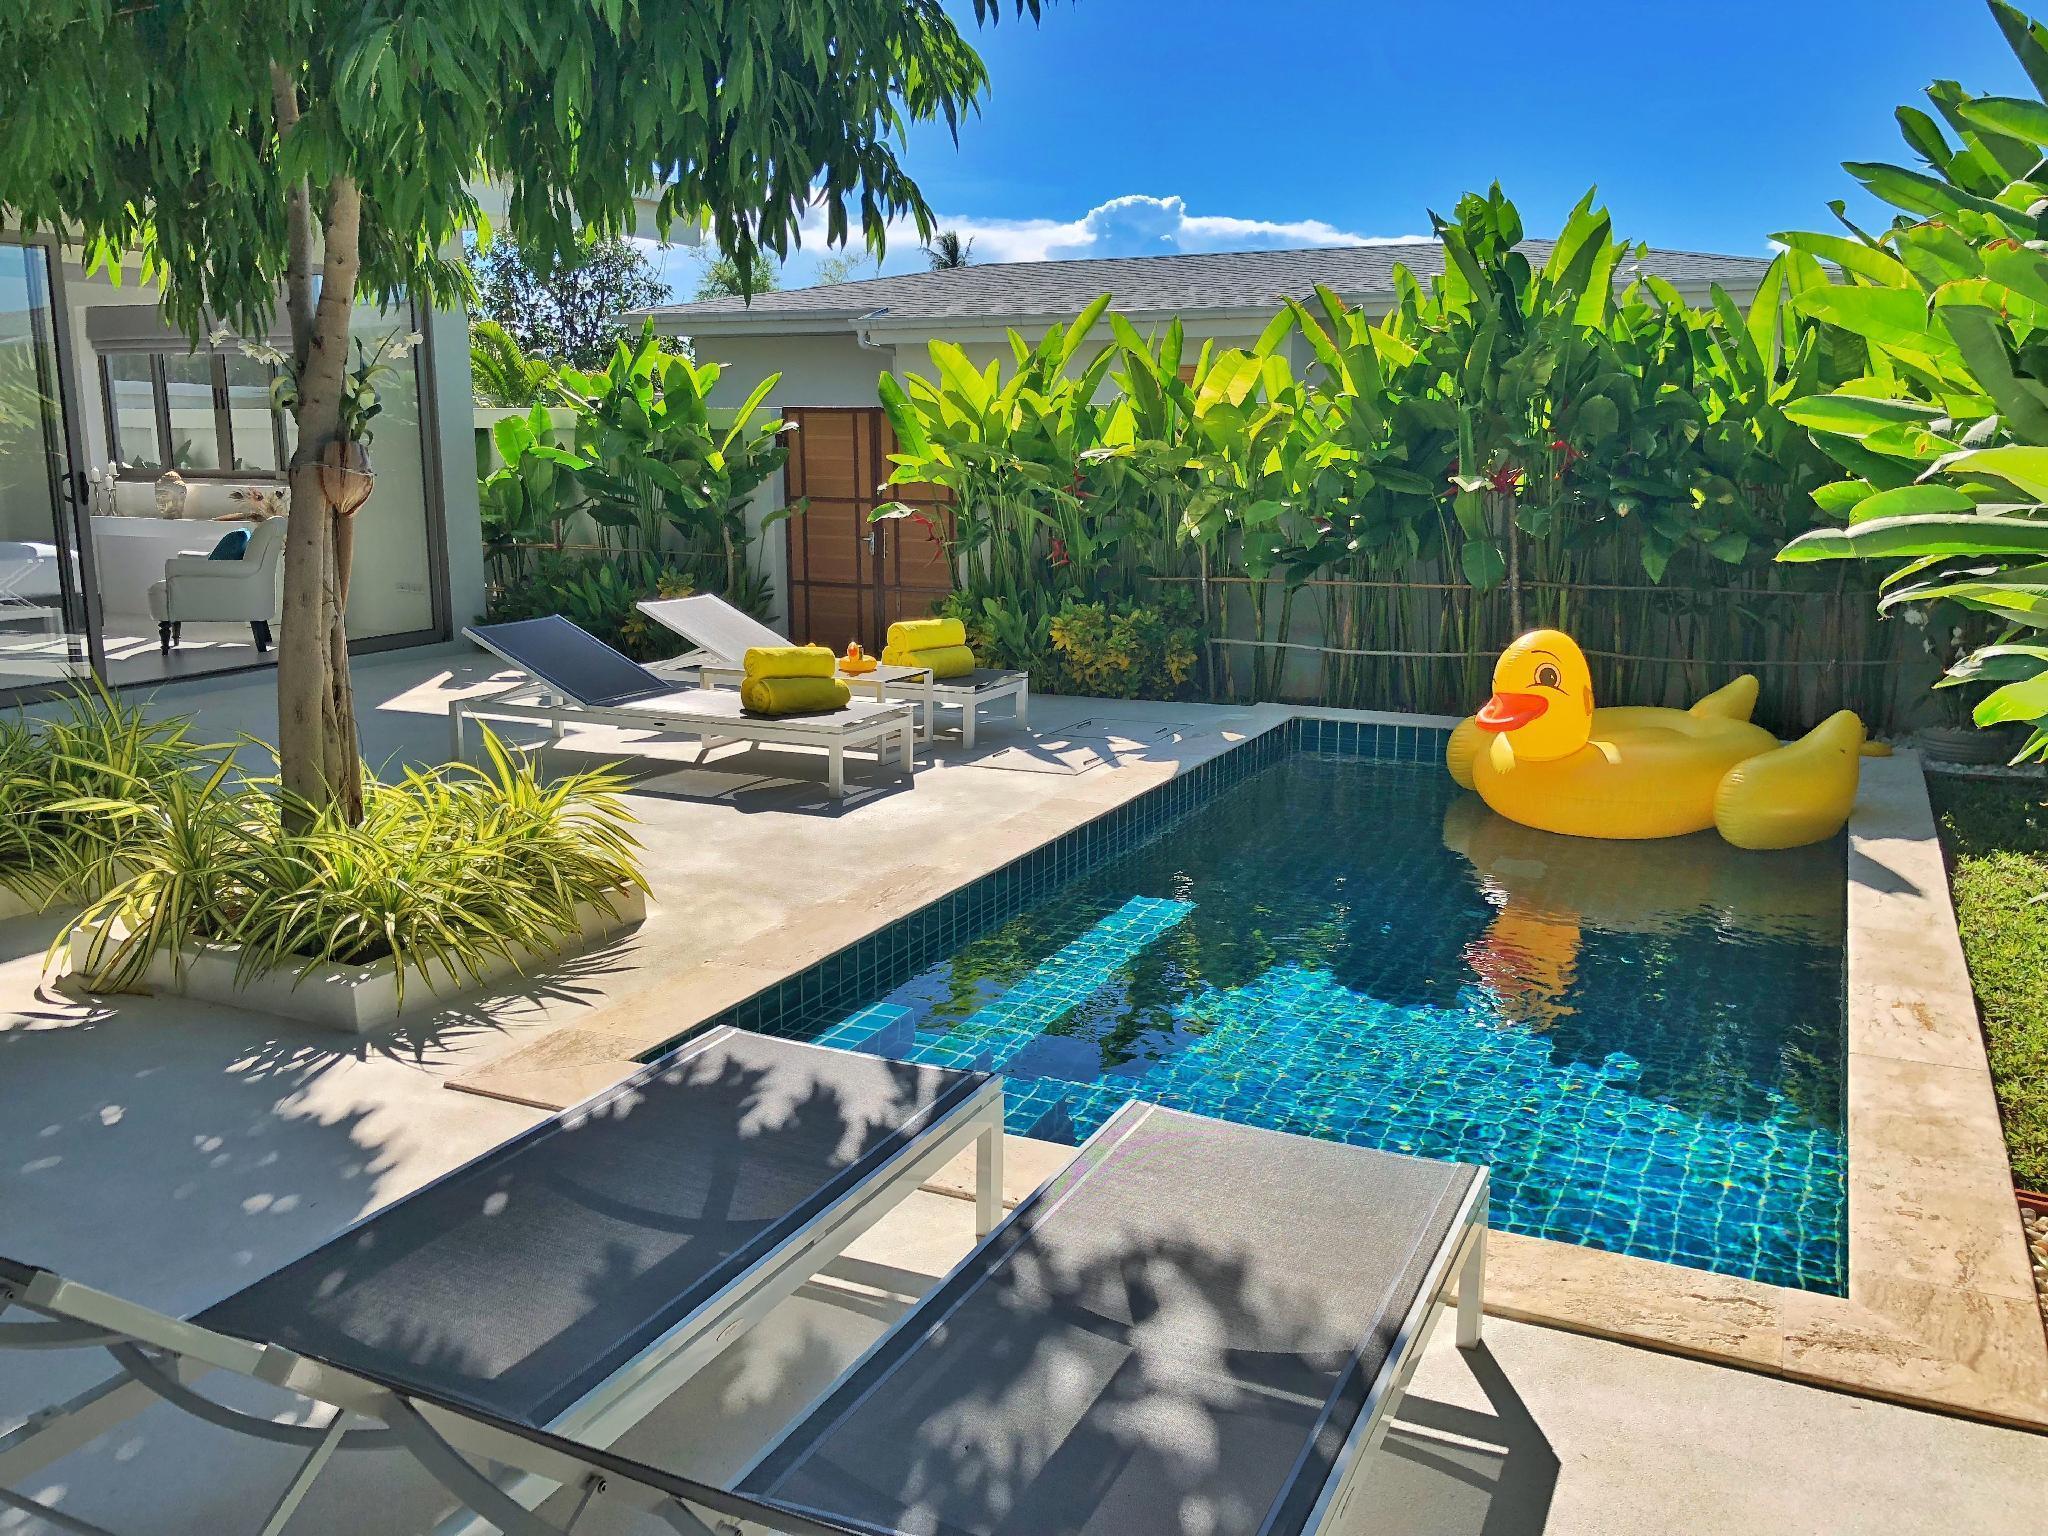 Villa White Orchid - A Private Oasis in Koh Samui Villa White Orchid - A Private Oasis in Koh Samui